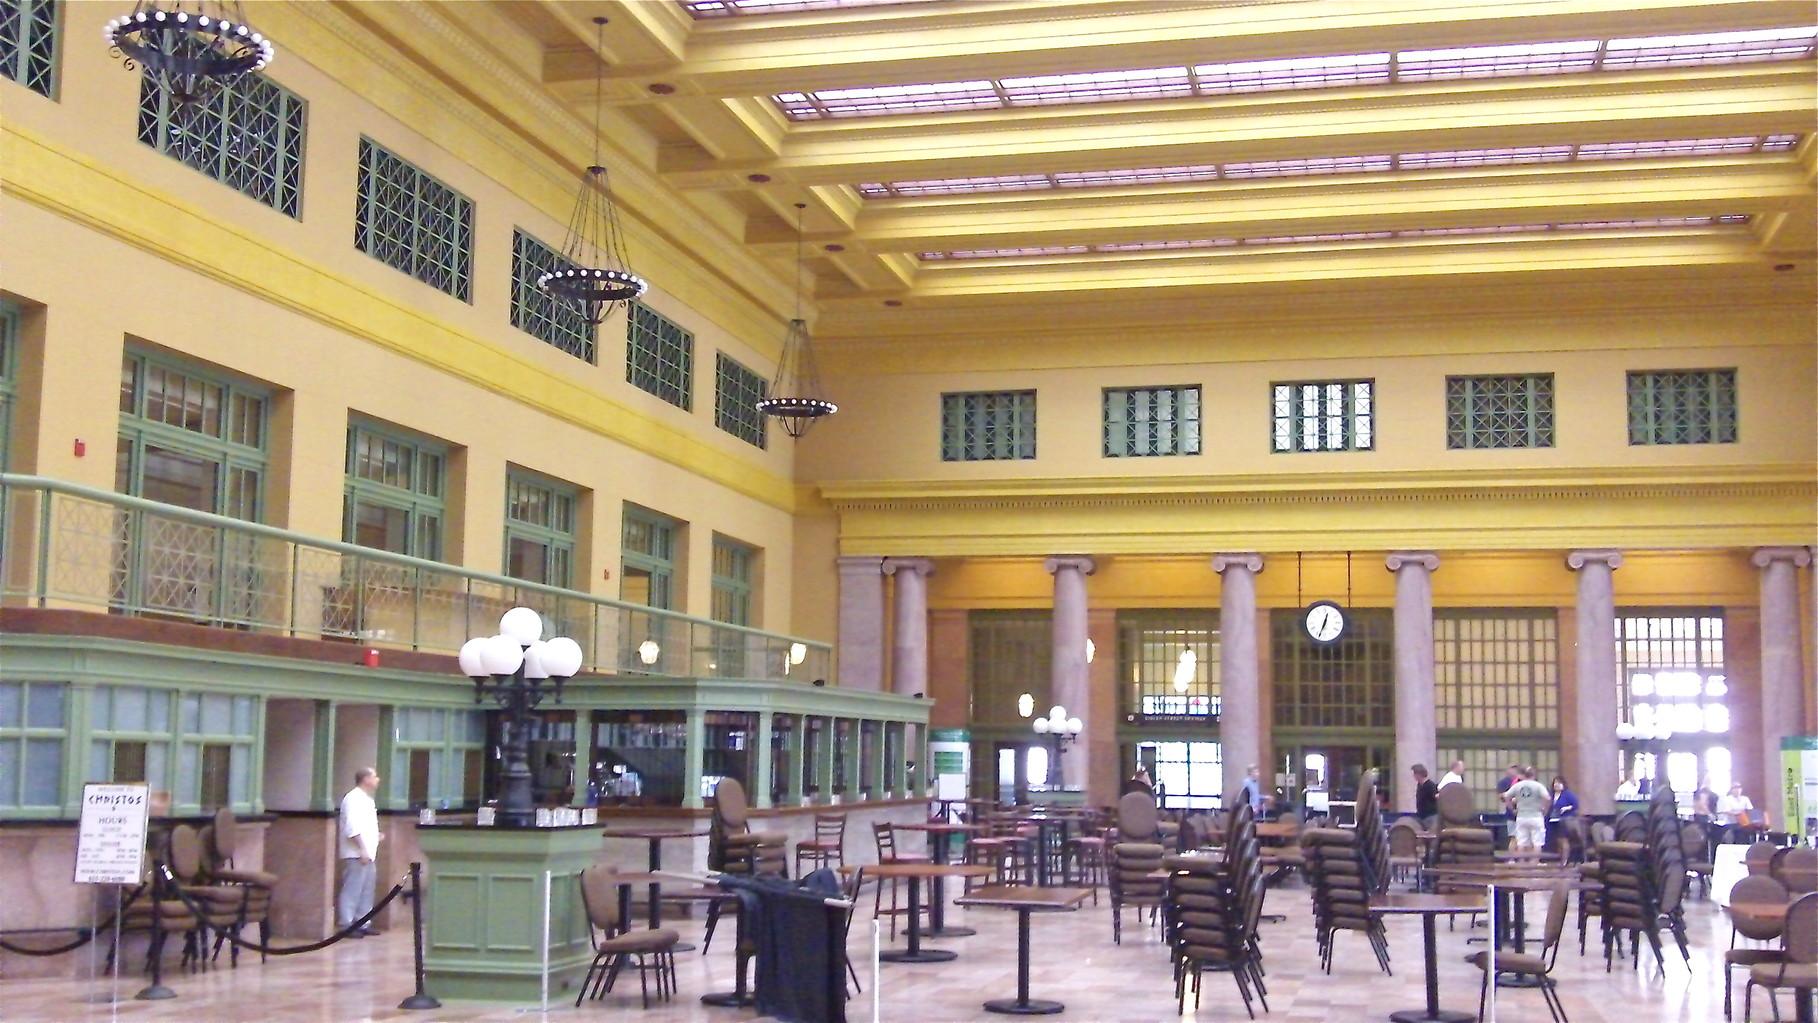 Inside Union Depot, near the Jazz Festival